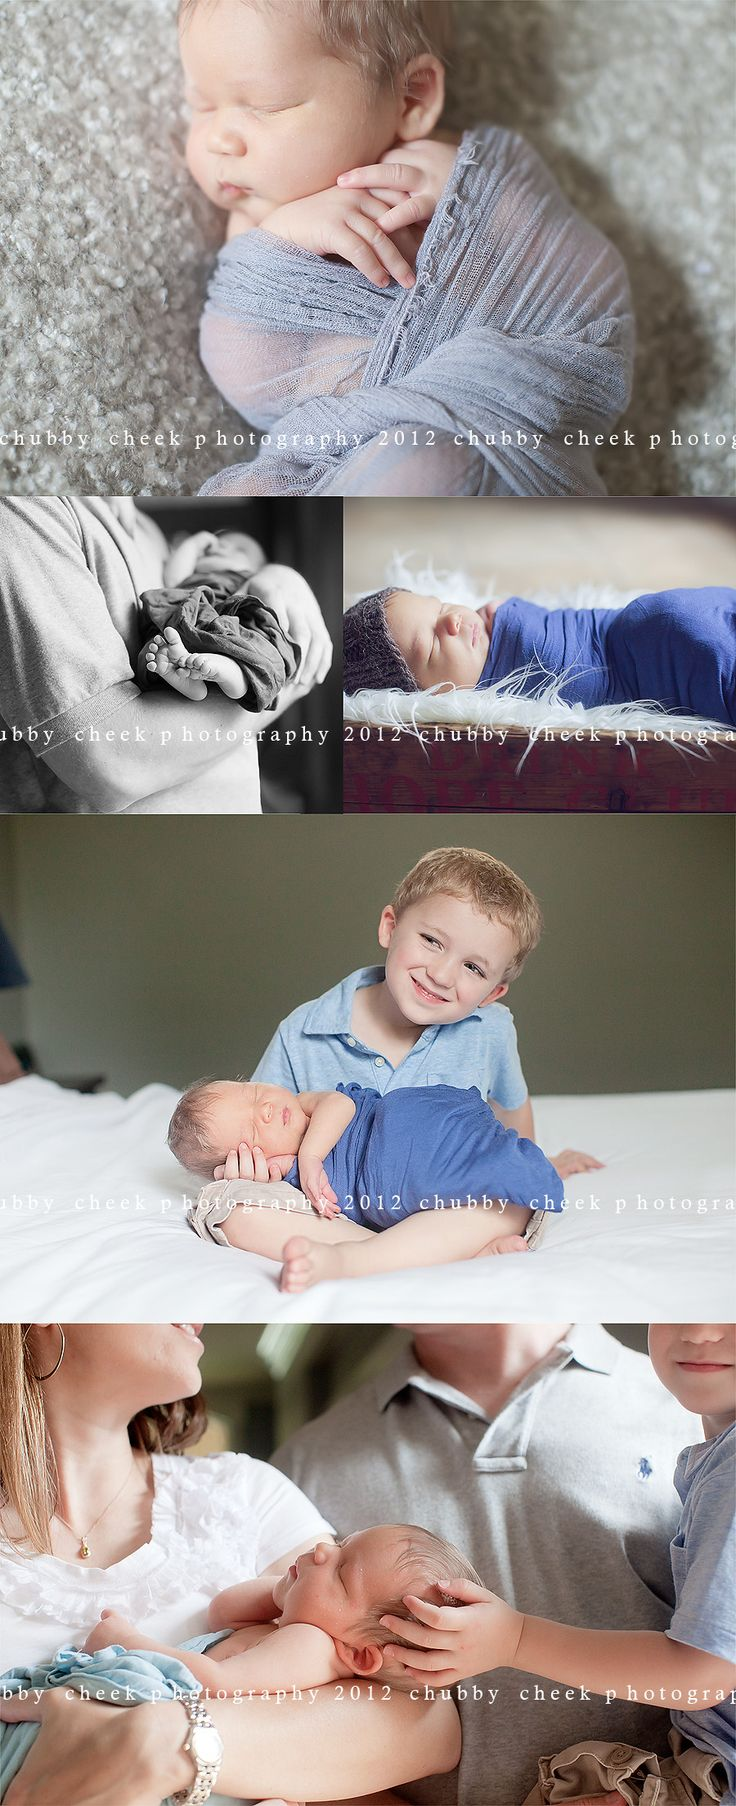 newborn shoot - chubby cheek